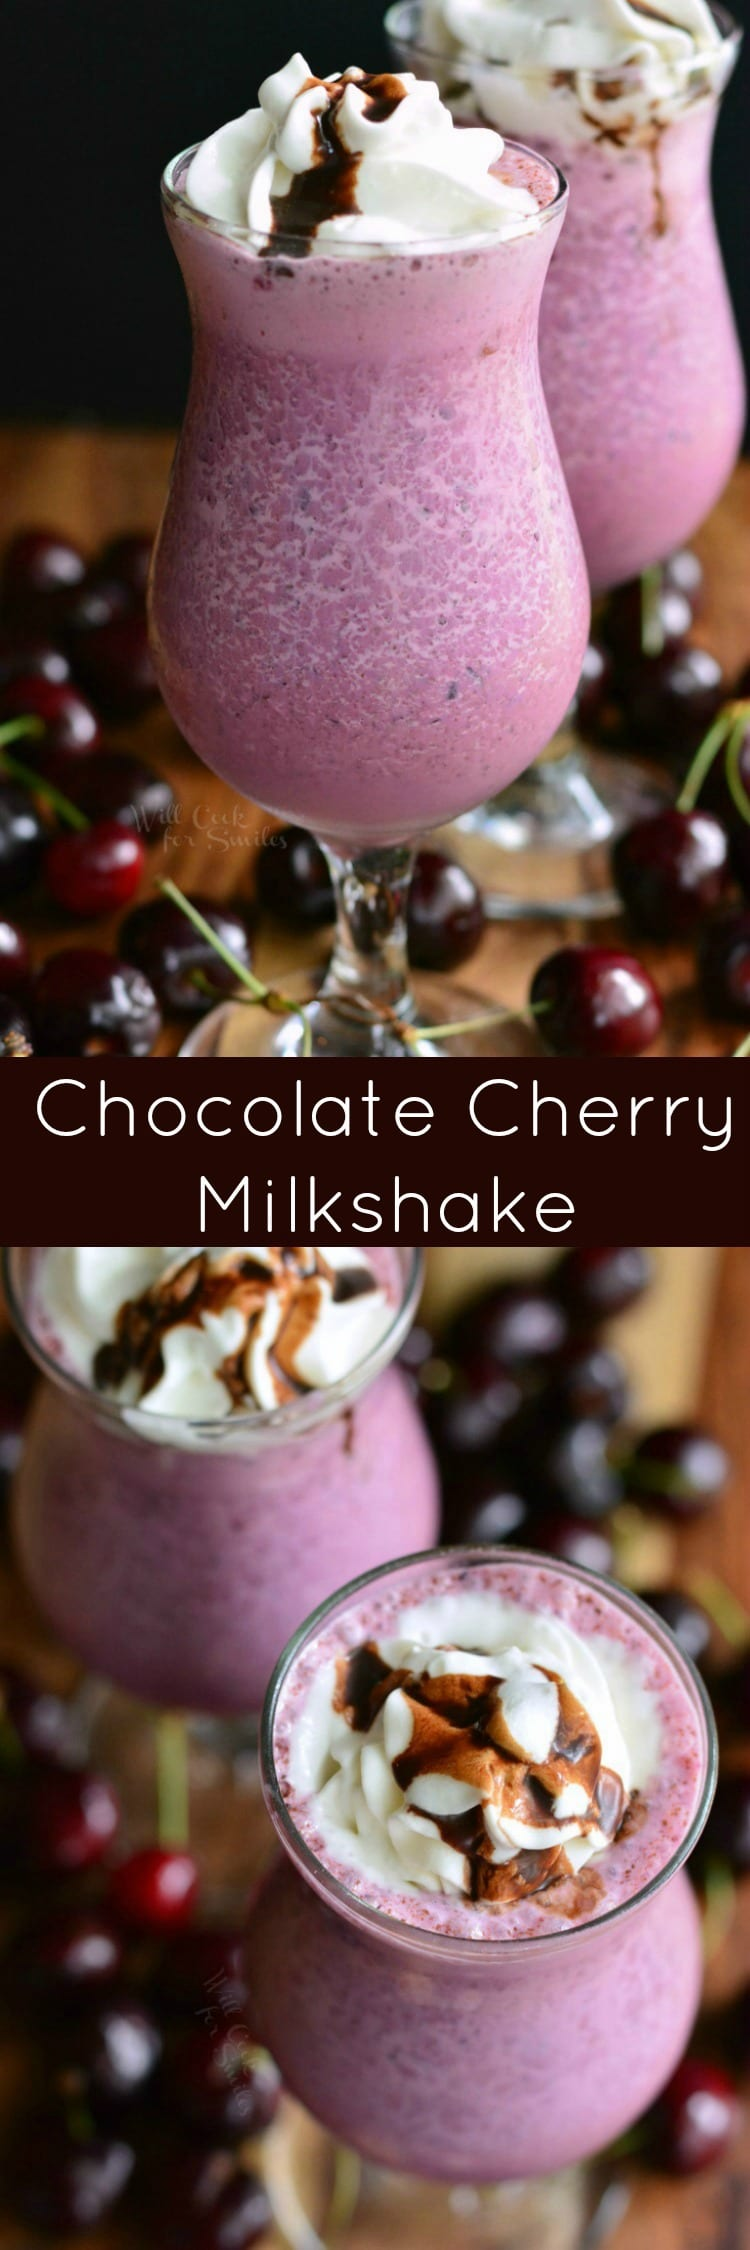 photo collage 2 Chocolate Covered Cherry Milkshakes with whip cream and chocolate on top with cherries around it bottom photo is top view of the cherry milkshake